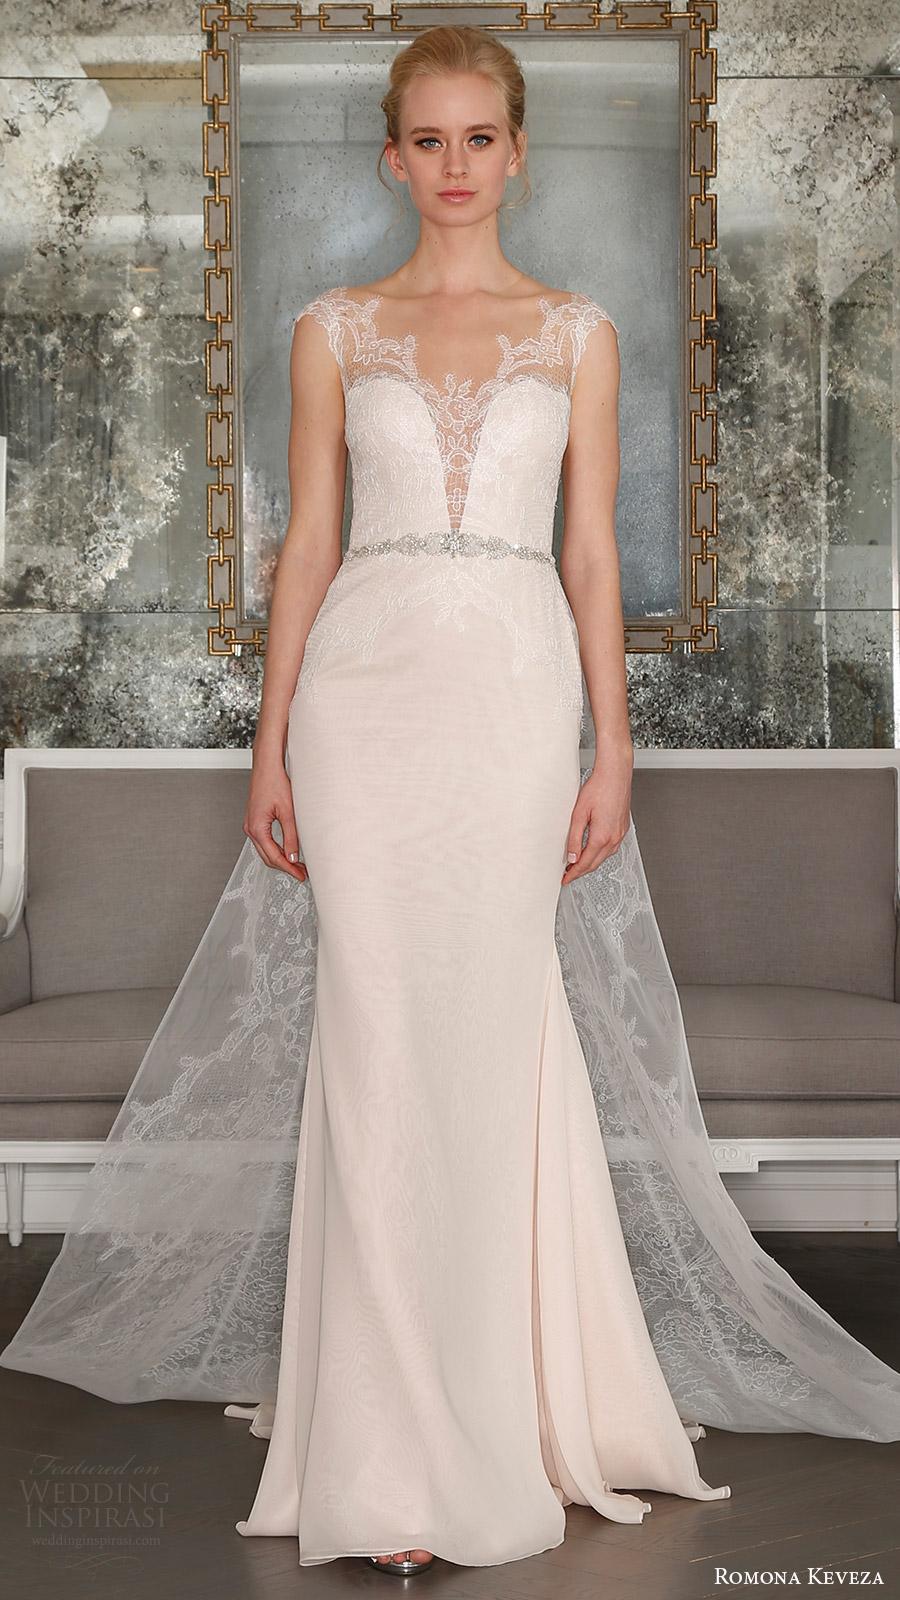 romona keveza bridal spring 2017 illusion cap sleeves sweetheart deep vneck sheath wedding dress (rk7405) mv detachable train